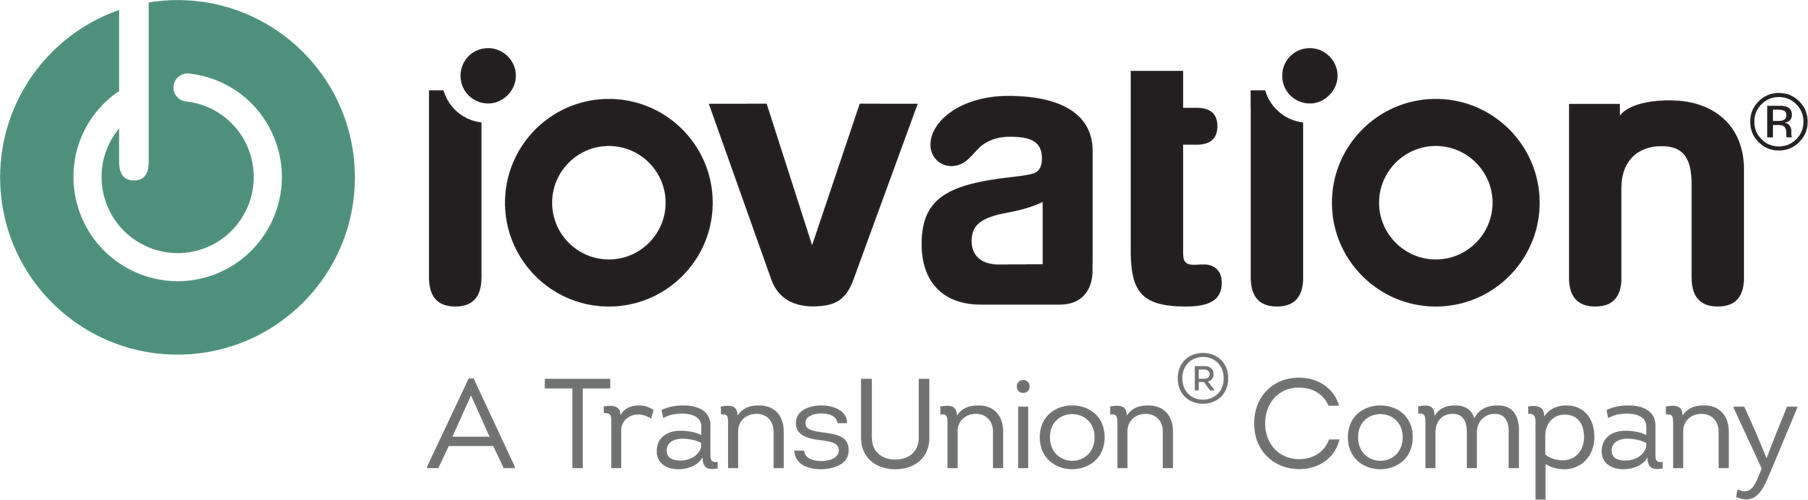 iovation, a TransUnion Company